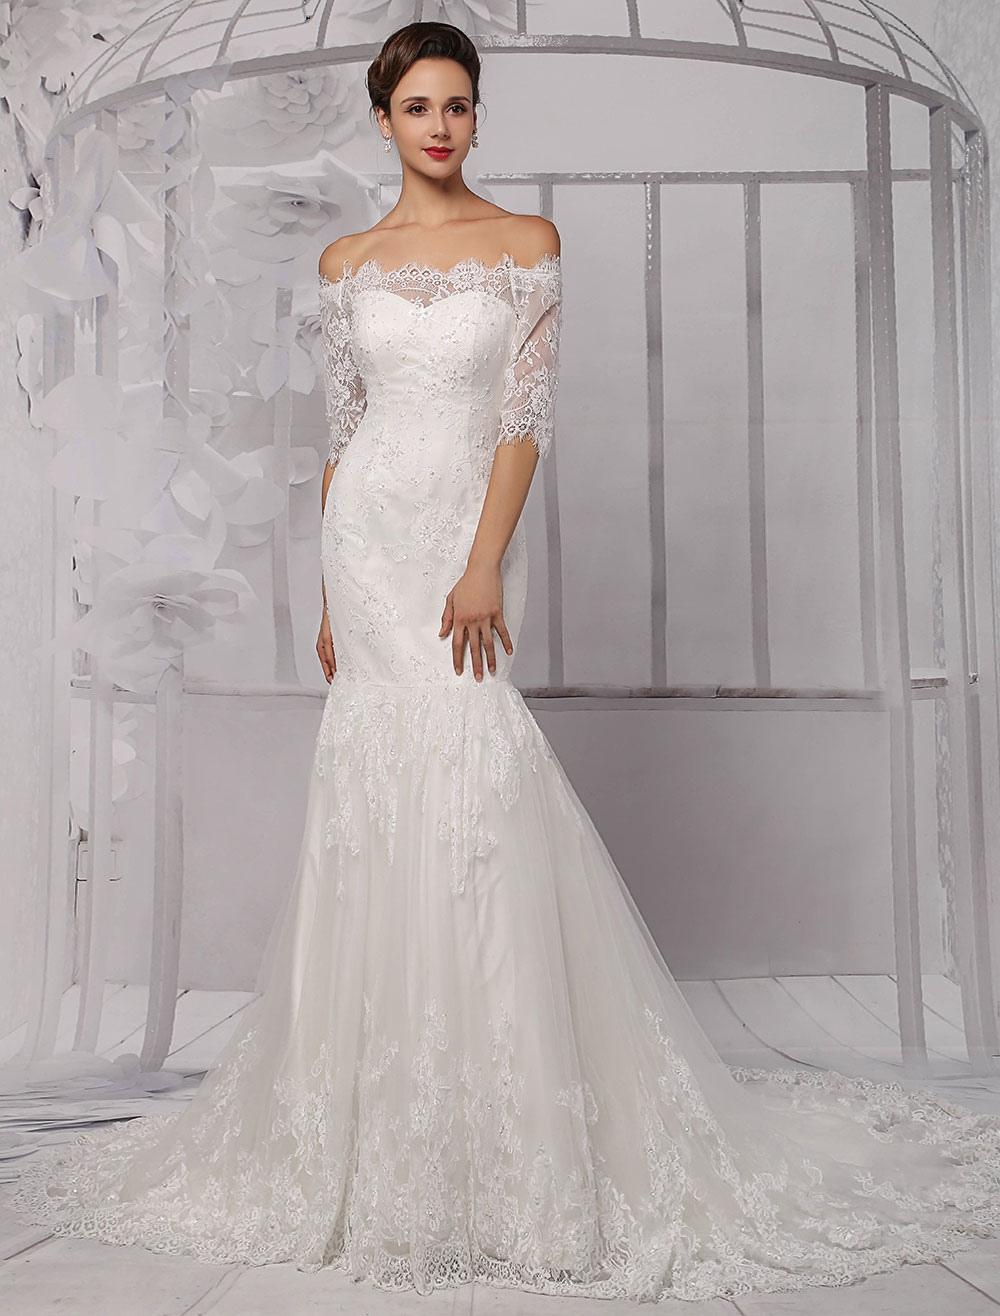 half sleeve wedding dresses 61 with half sleeve wedding dresses half sleeve wedding dress Half Sleeve Wedding Dresses 61 with Half Sleeve Wedding Dresses